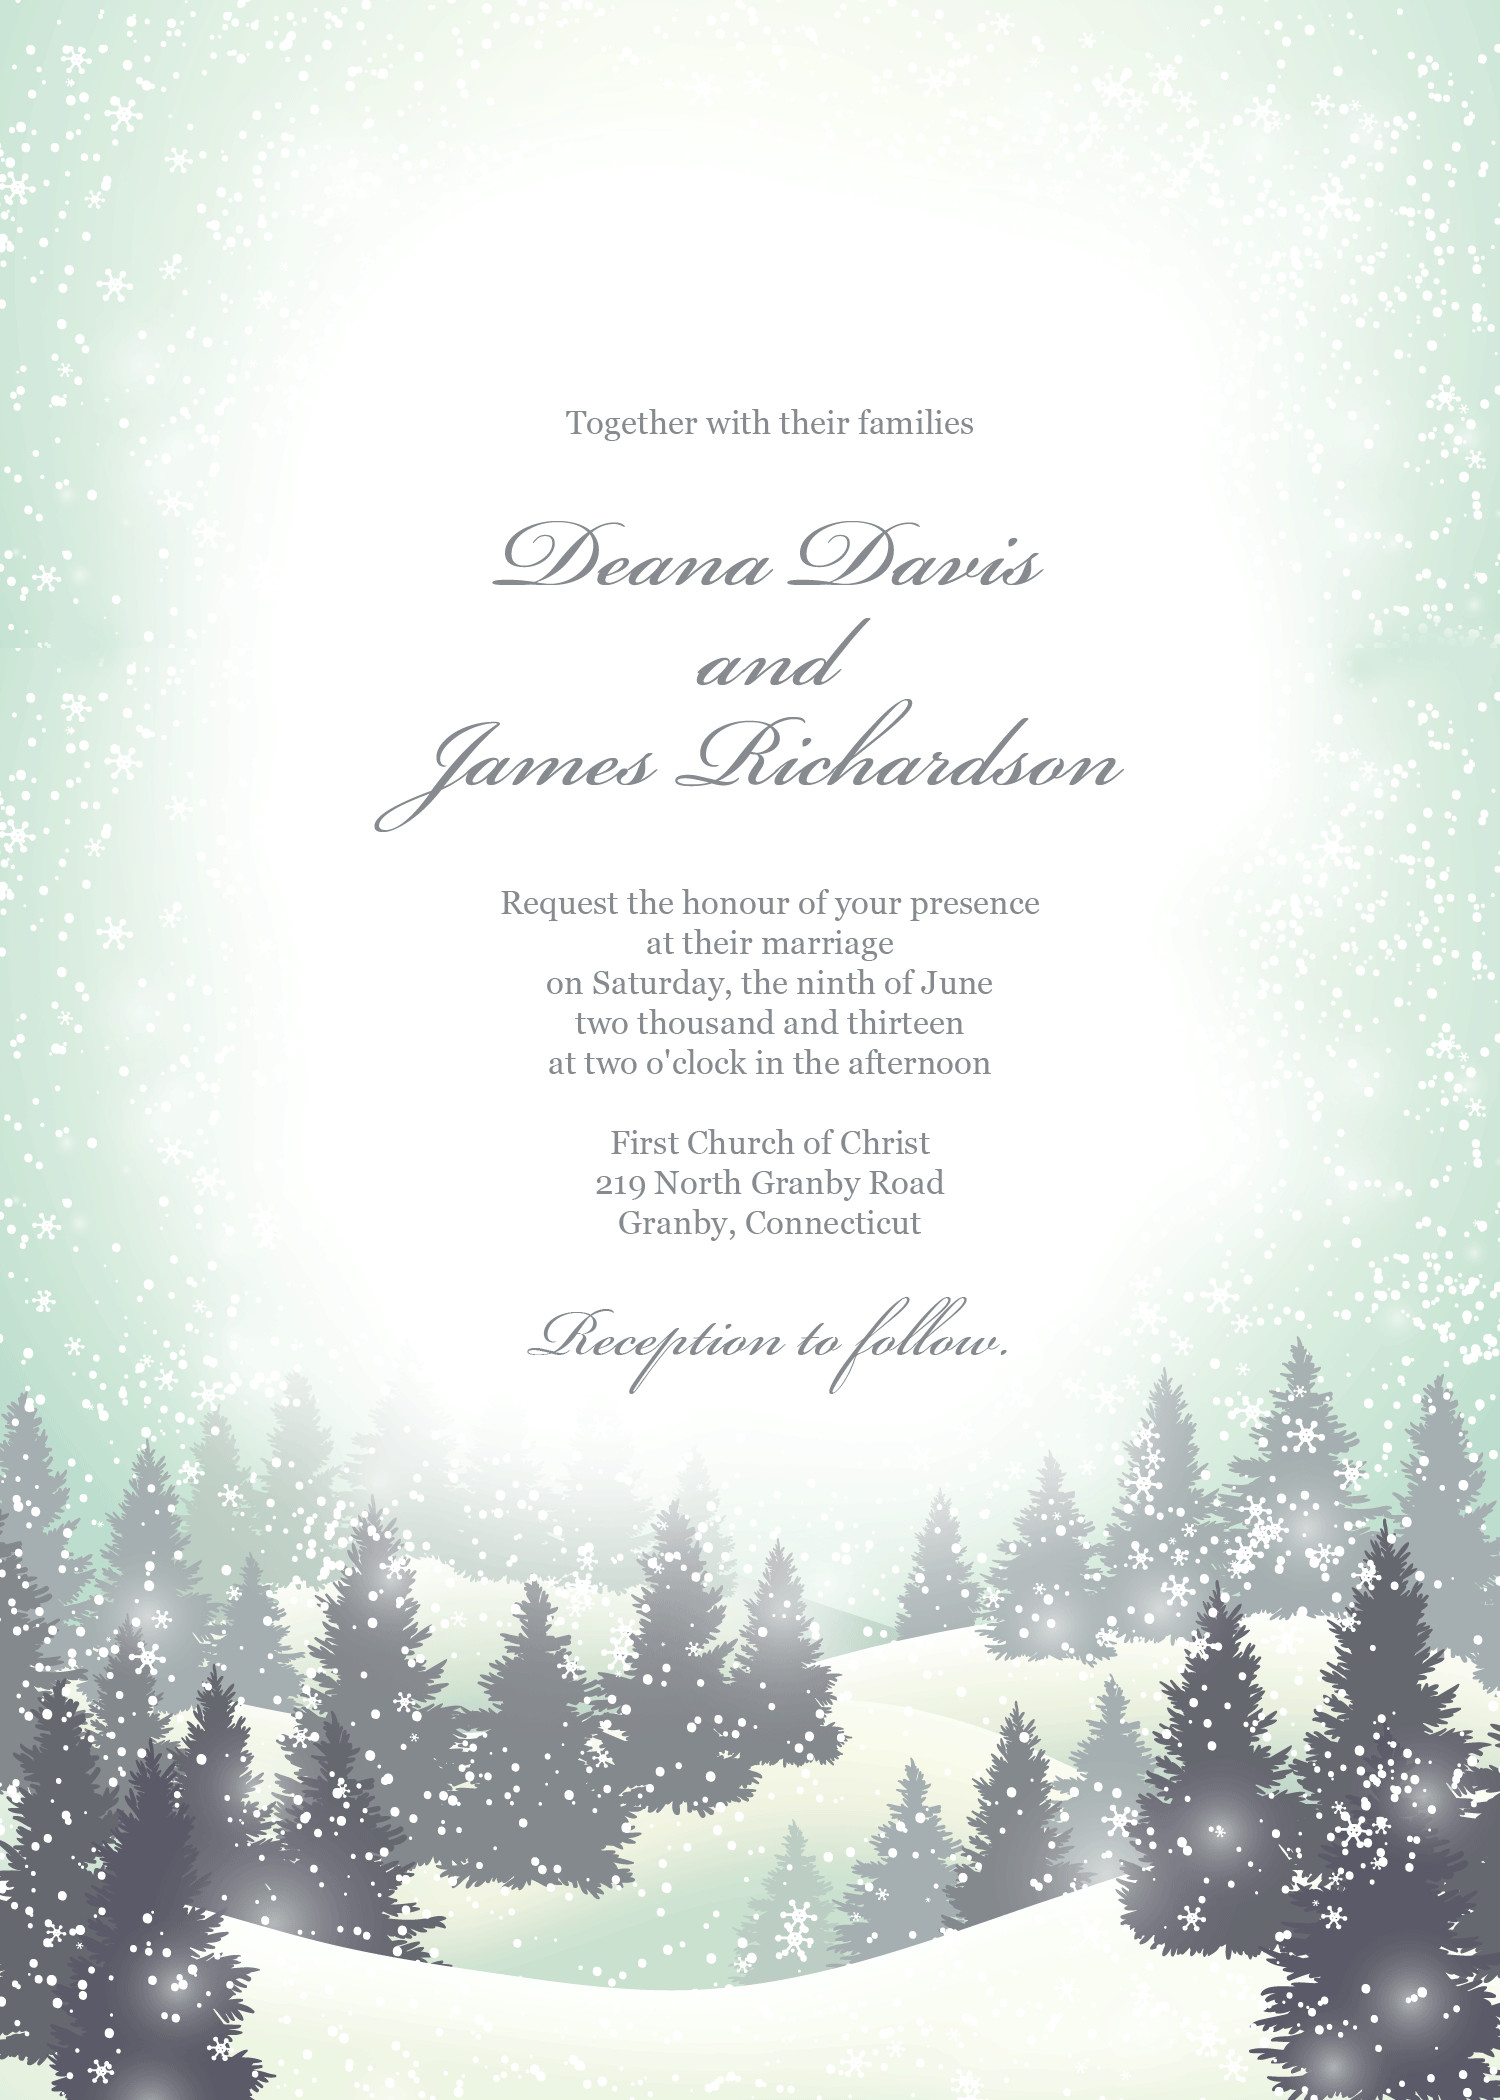 Free Winter Wonderland Invitations Templates Free Pdf Invitation Template Winter Wonderland Can Also